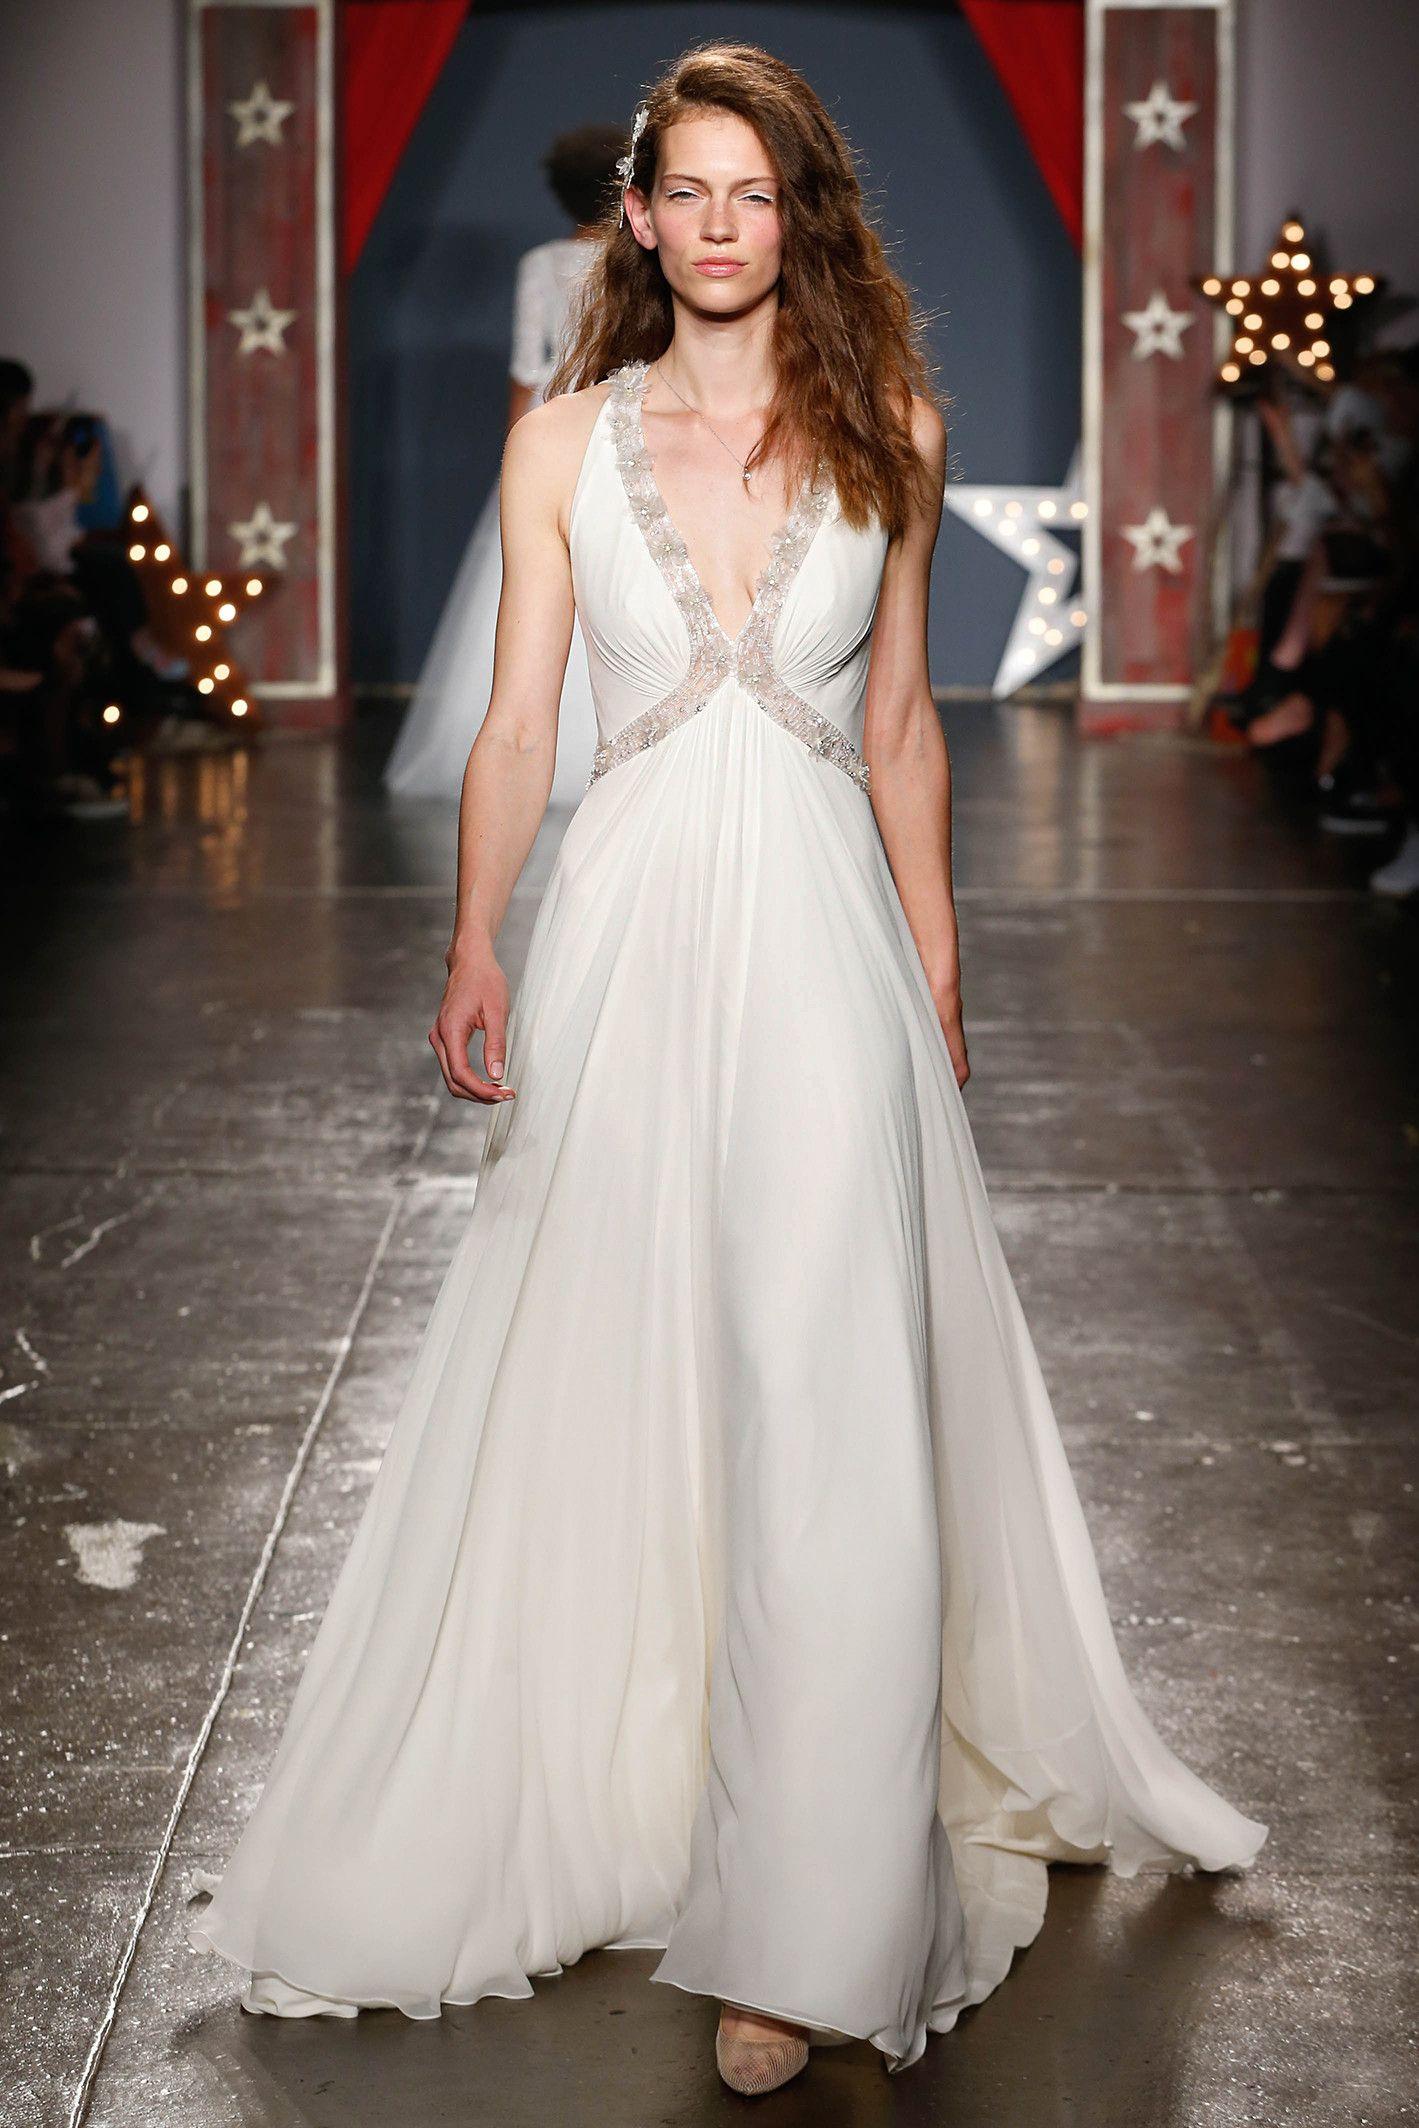 Halter style wedding dresses  Jenny Packham Spring  Wedding Dress Collection  fashion